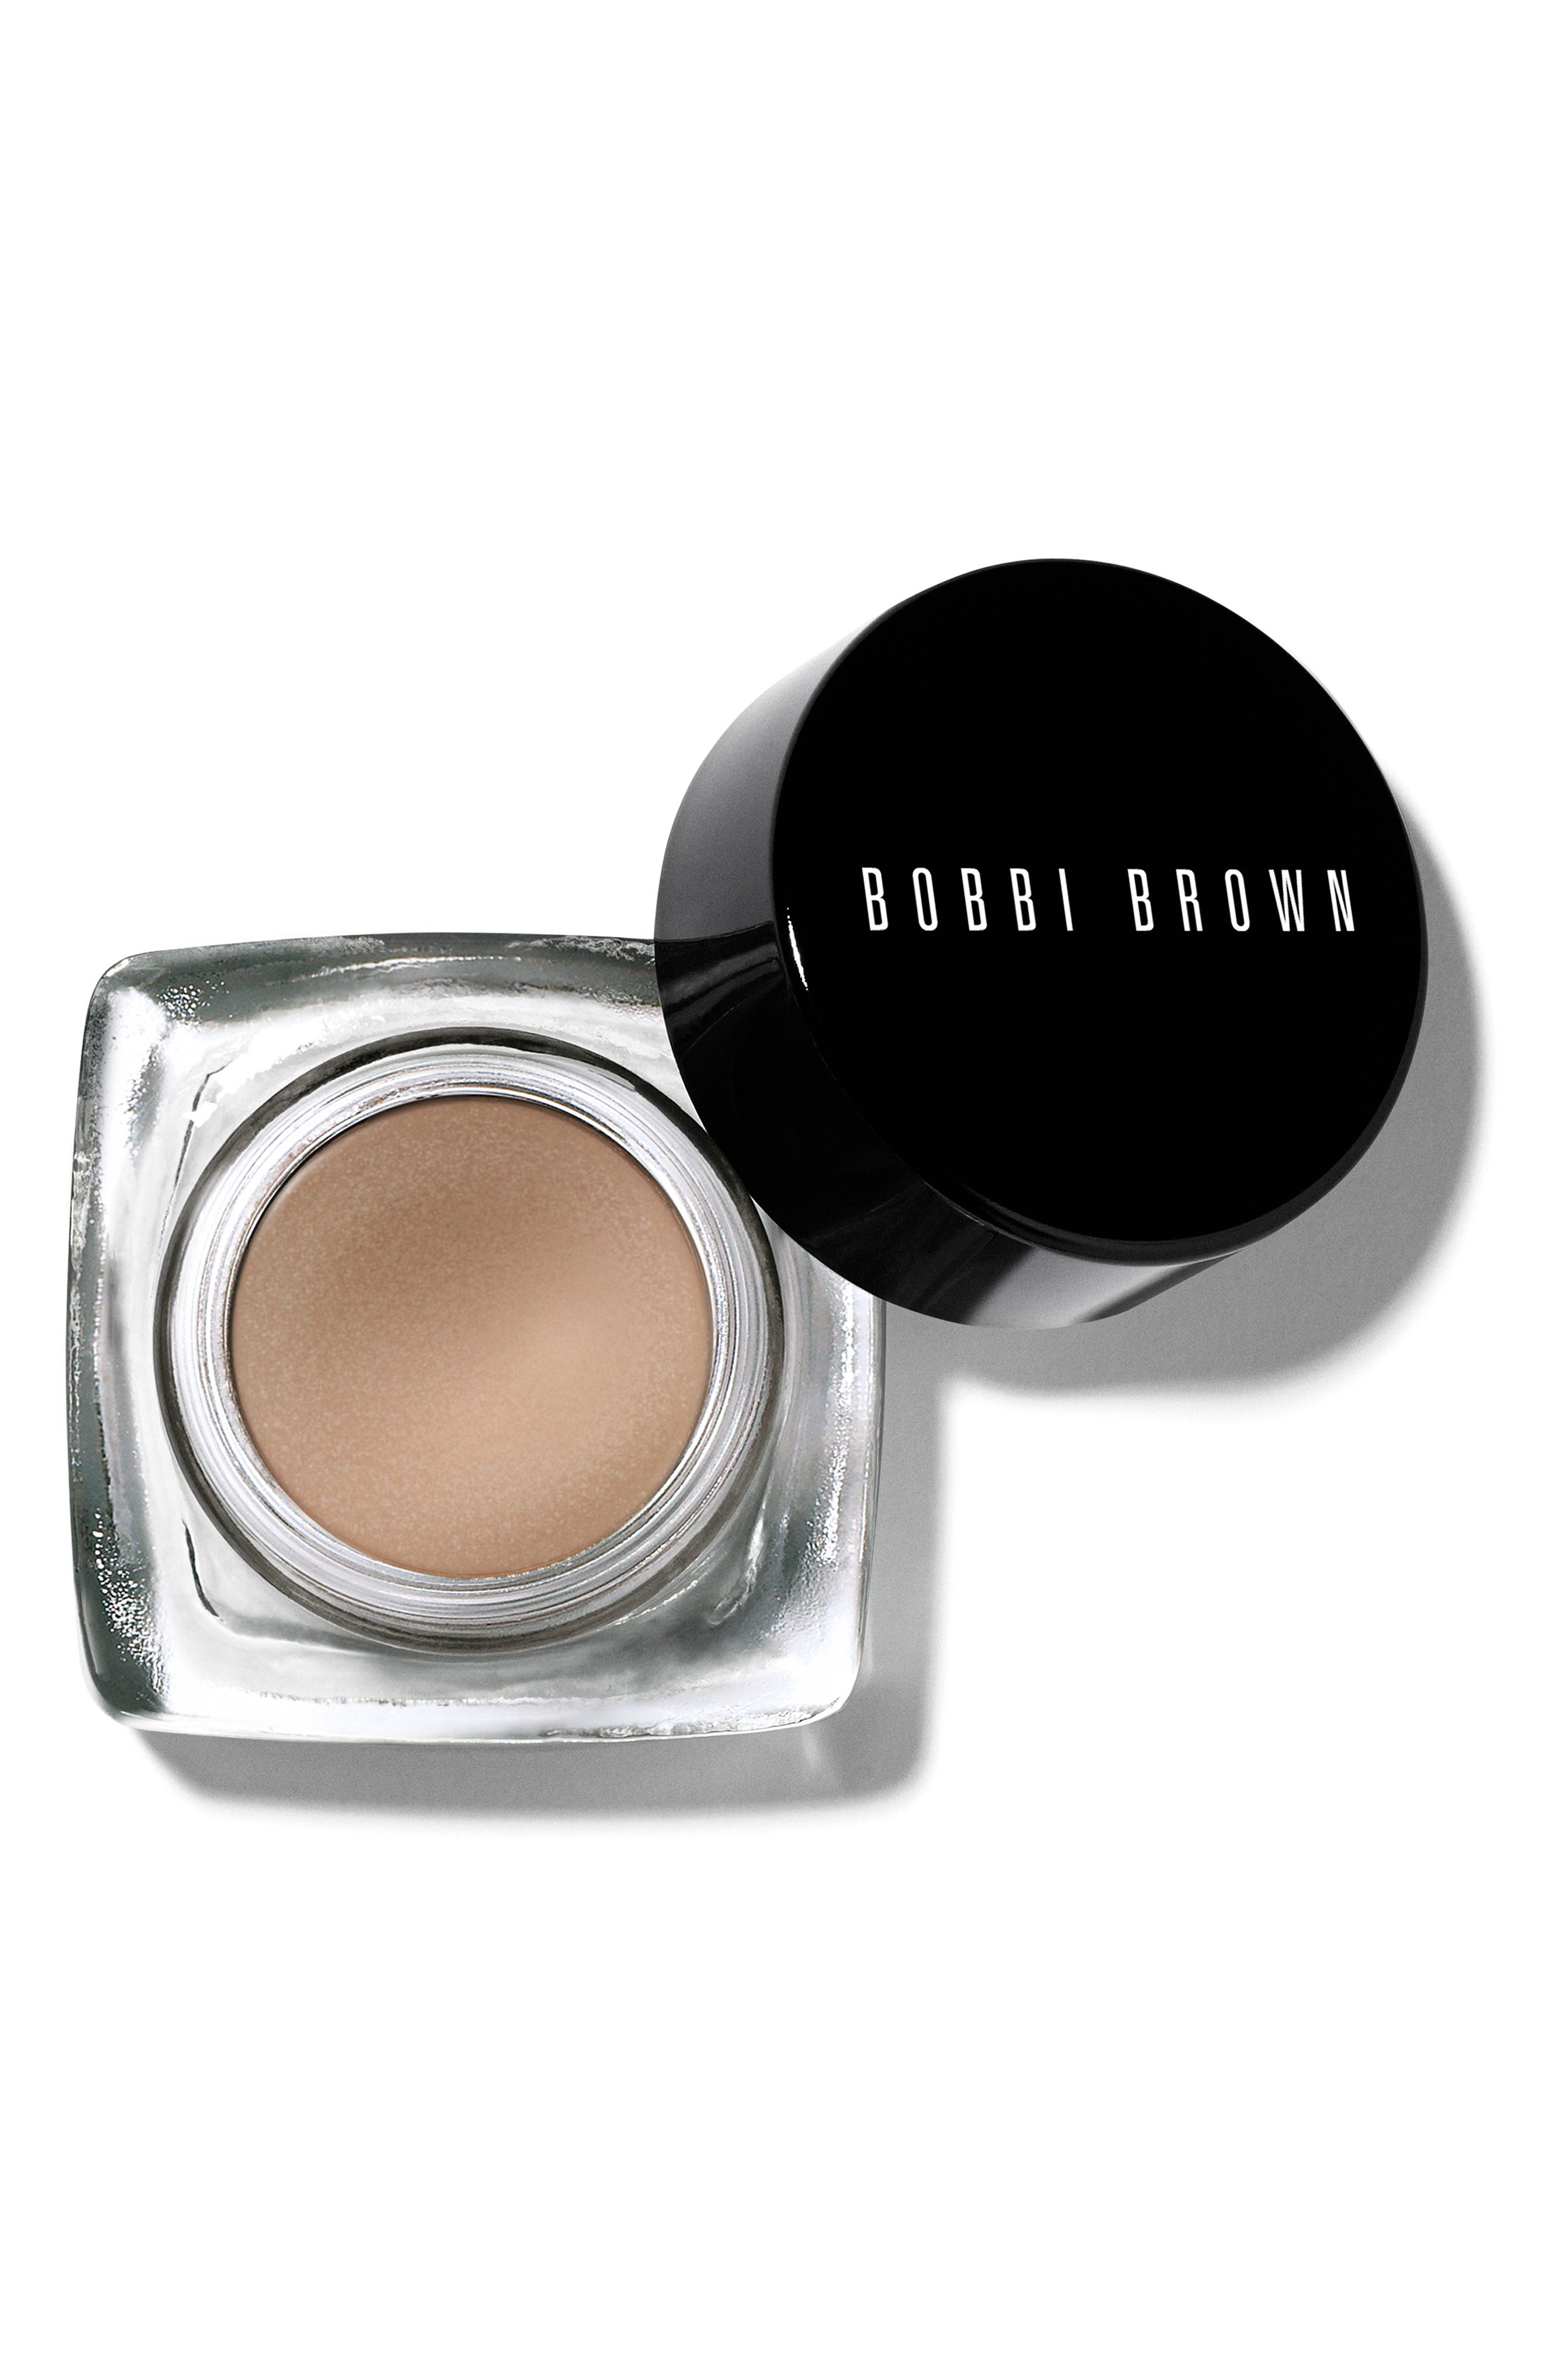 BOBBI BROWN, Long-Wear Cream Shadow, Main thumbnail 1, color, CEMENT